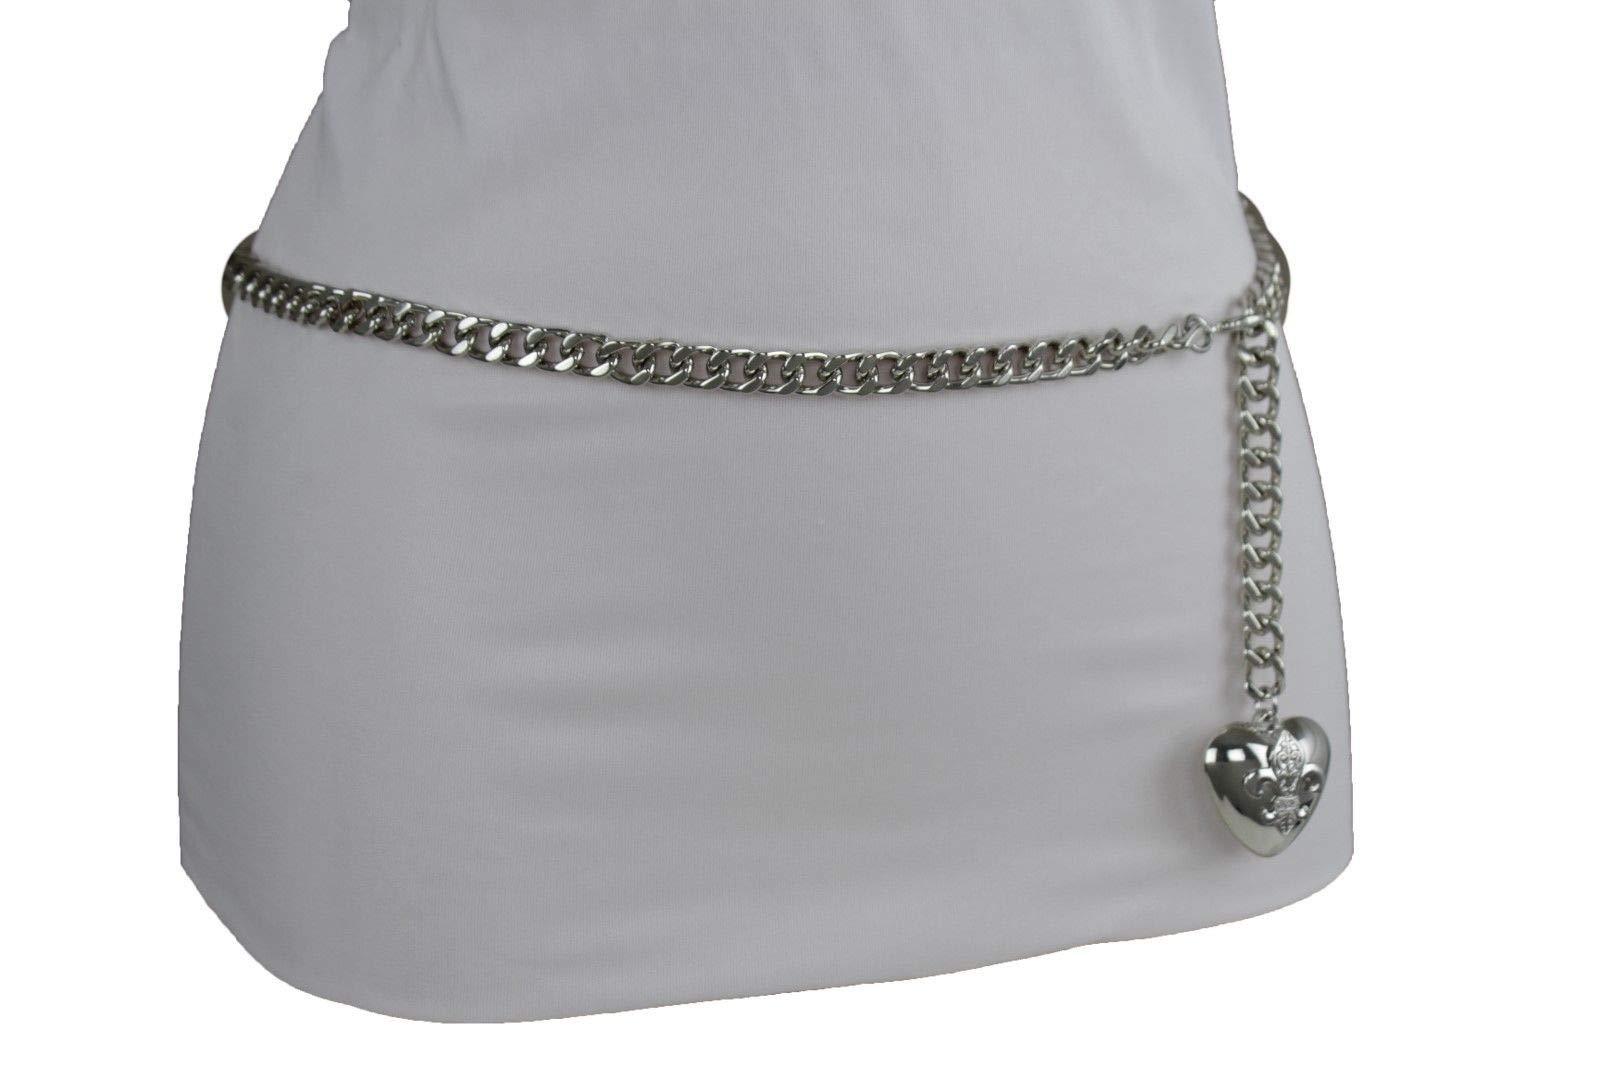 Women Hip Waist Silver Metal Chain Fashion Belt Love Heart Buckle Charm XS S M by RIX Fashion Luxury (Image #10)